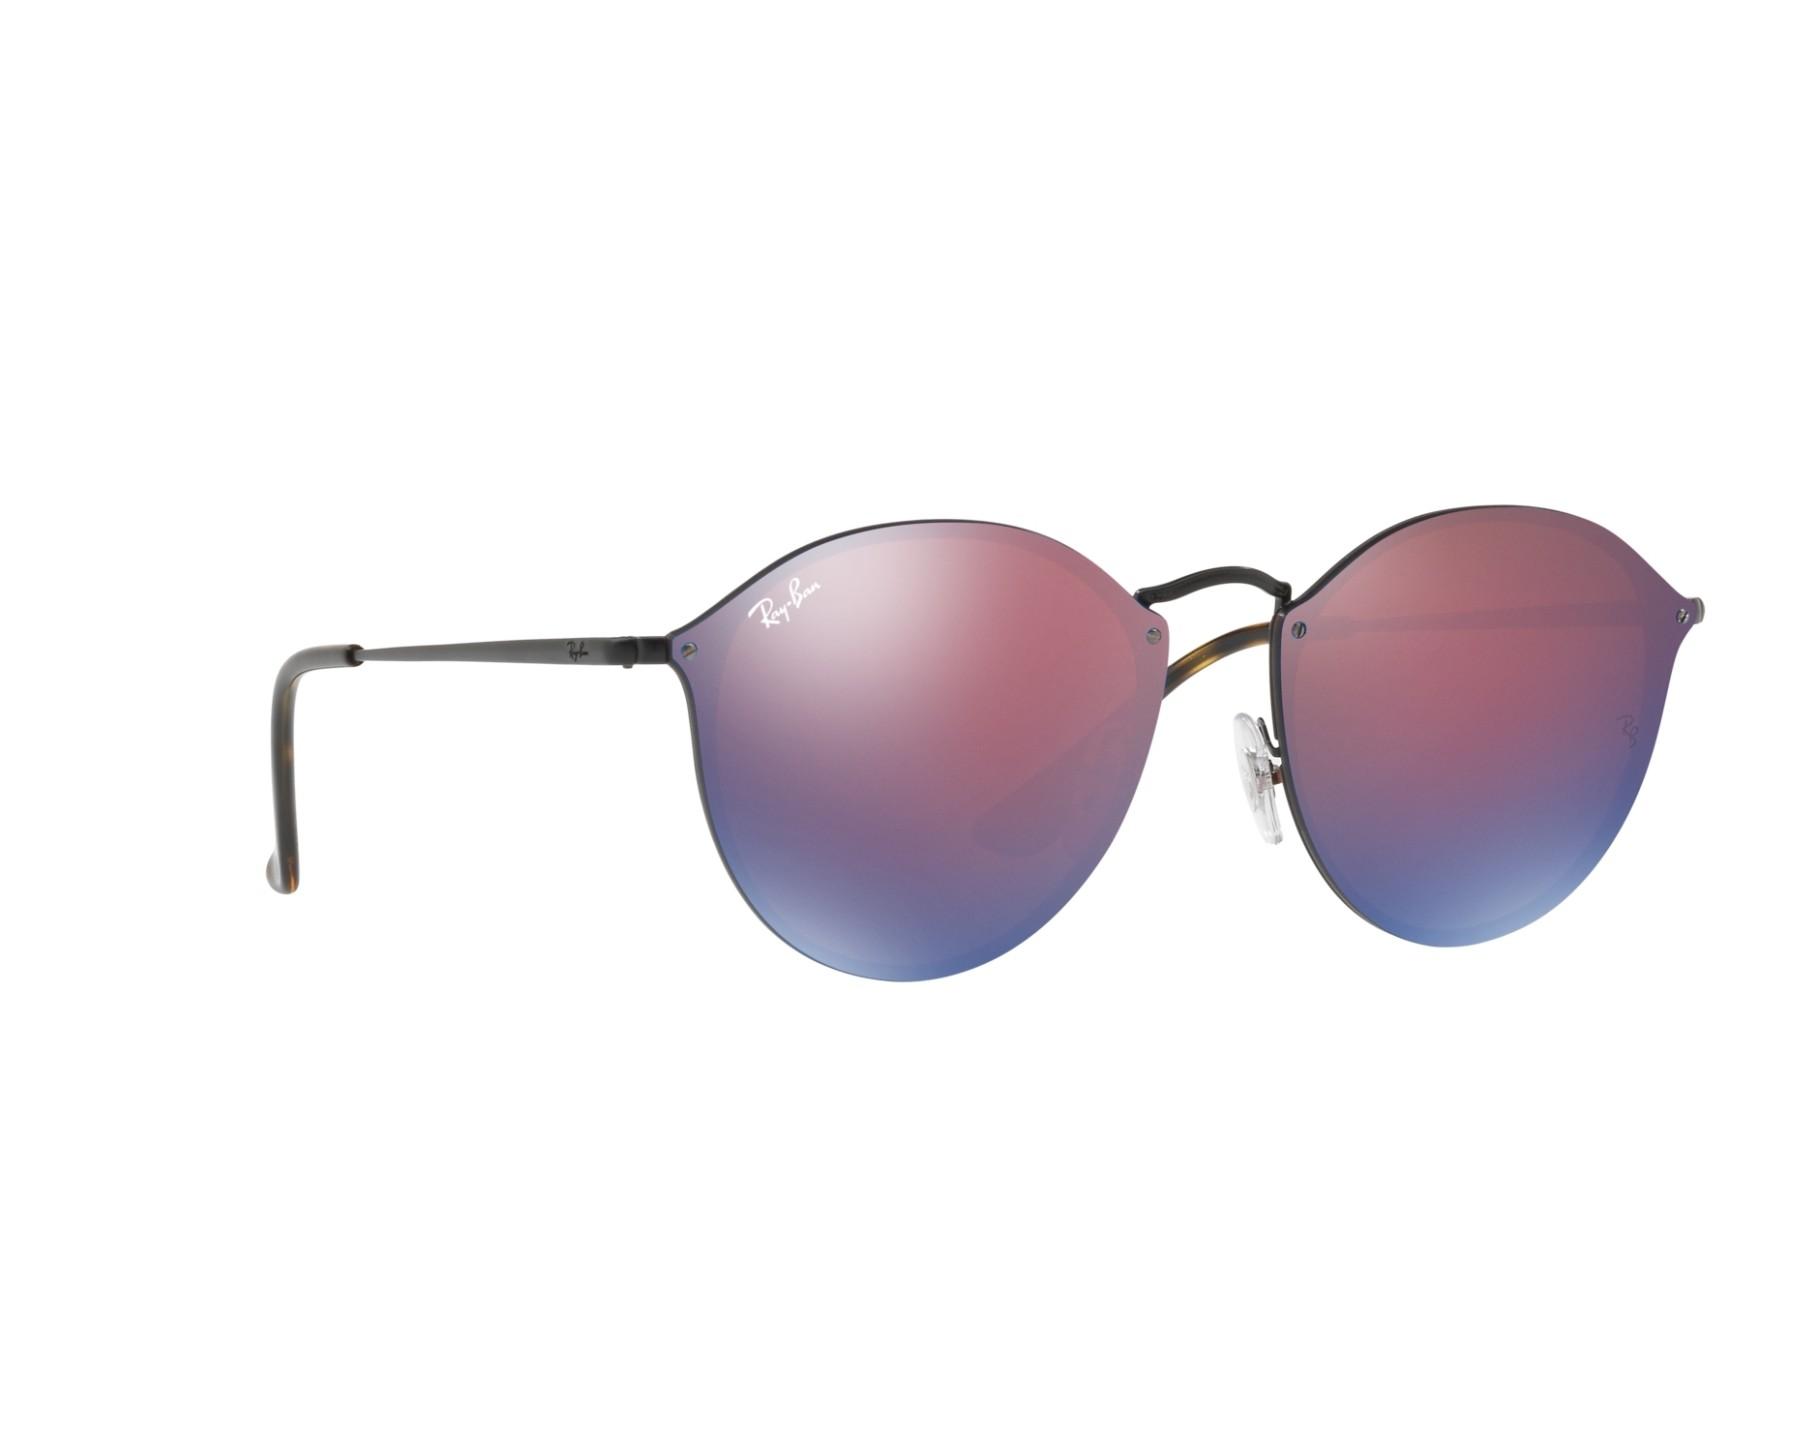 d7233b2571 Ray-Ban Sunglasses RB-3574-N 153 7V